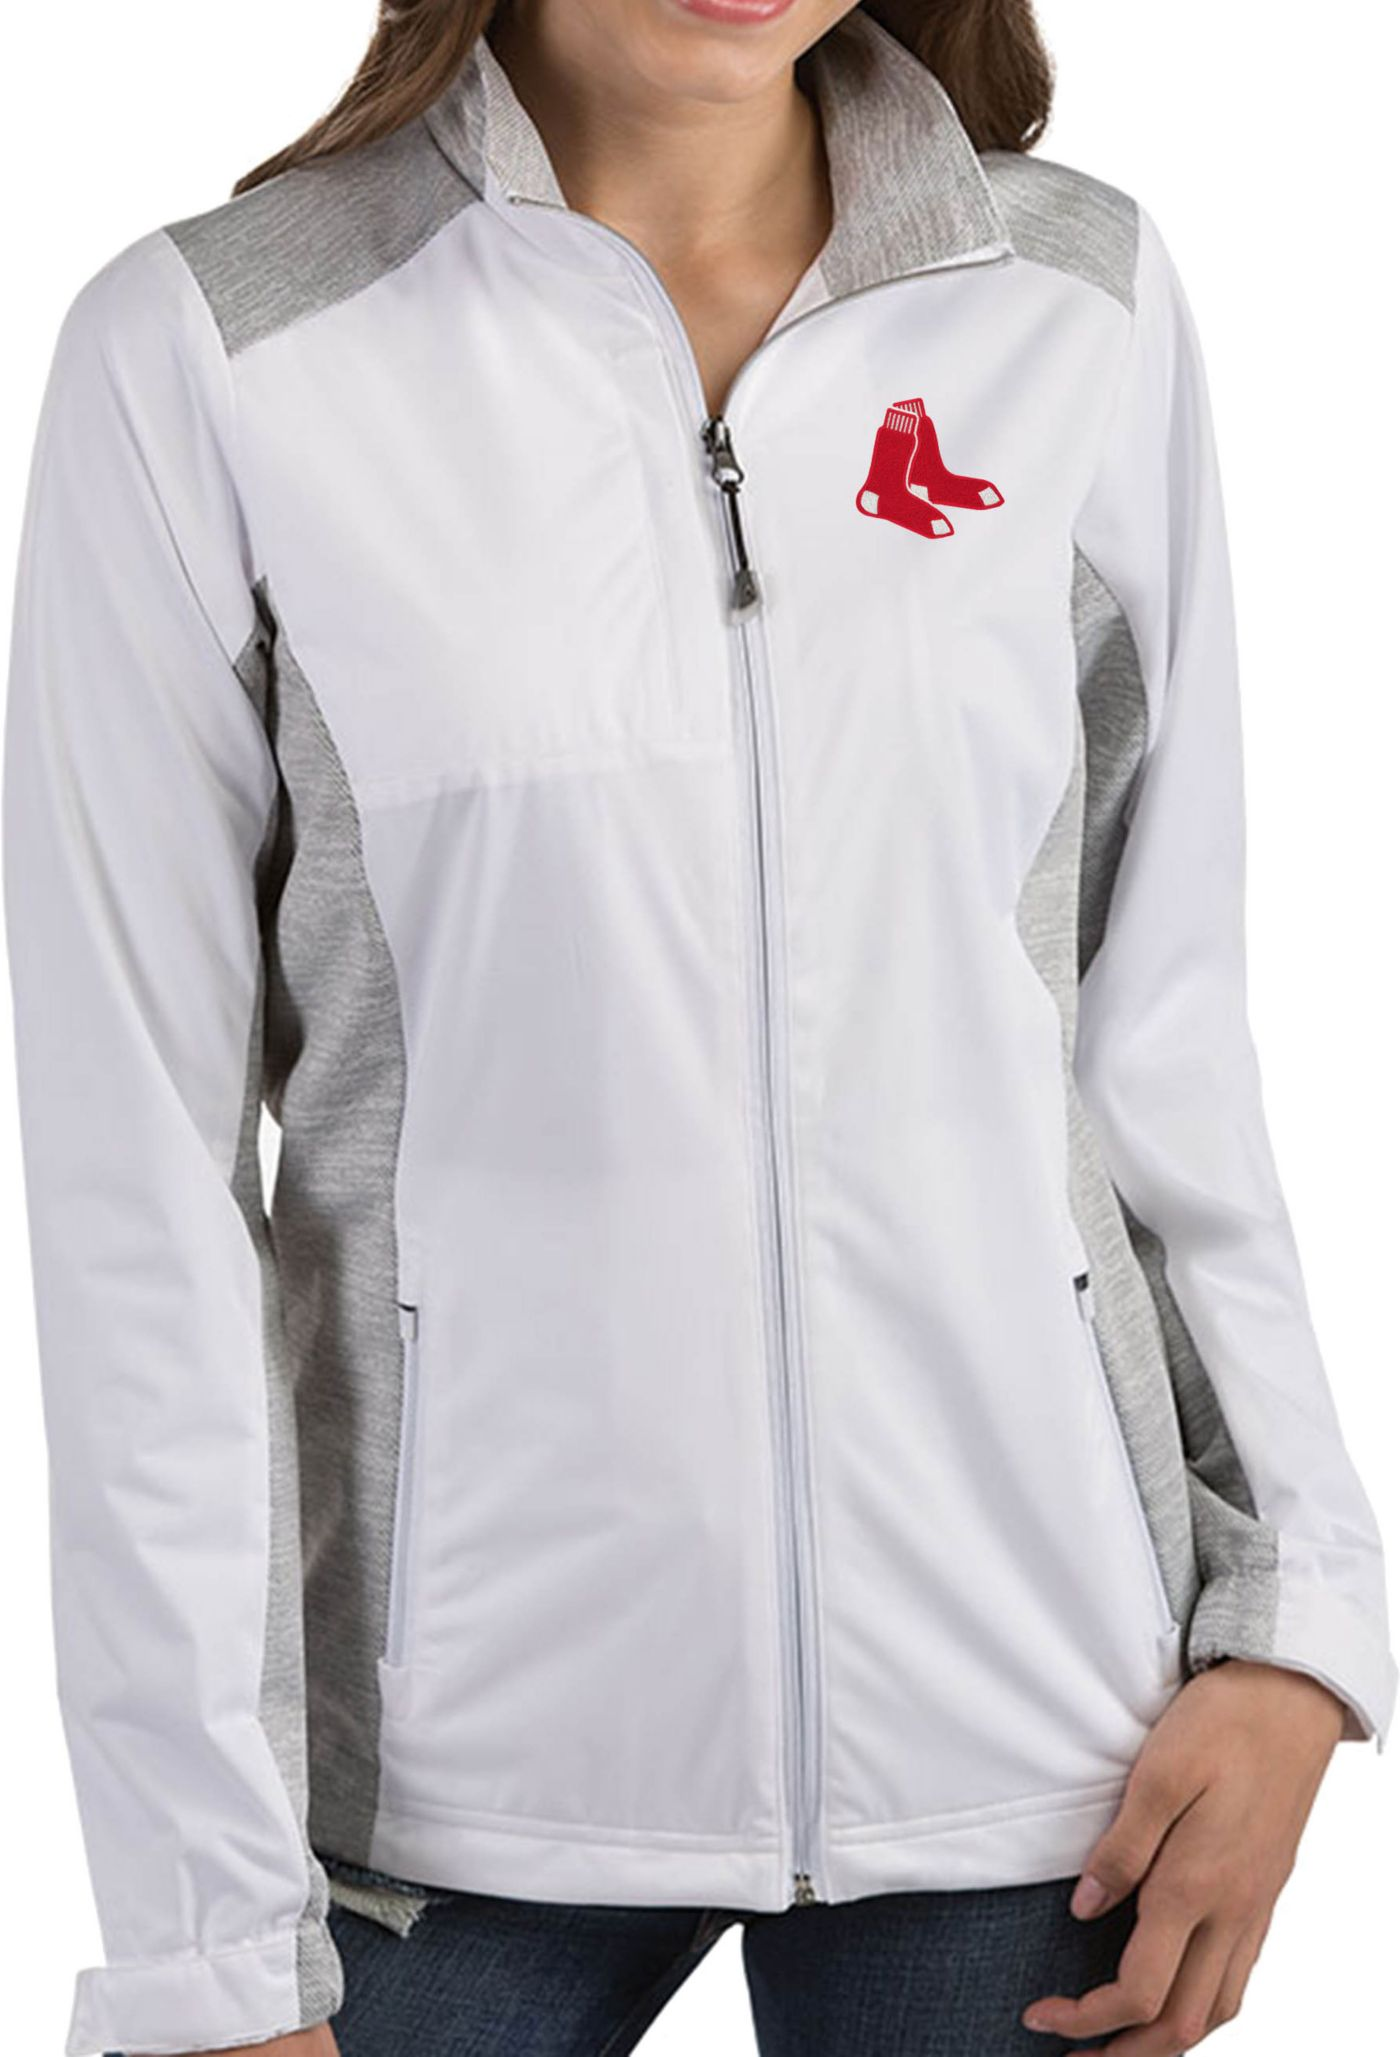 Antigua Women's Boston Red Sox Revolve White Full-Zip Jacket